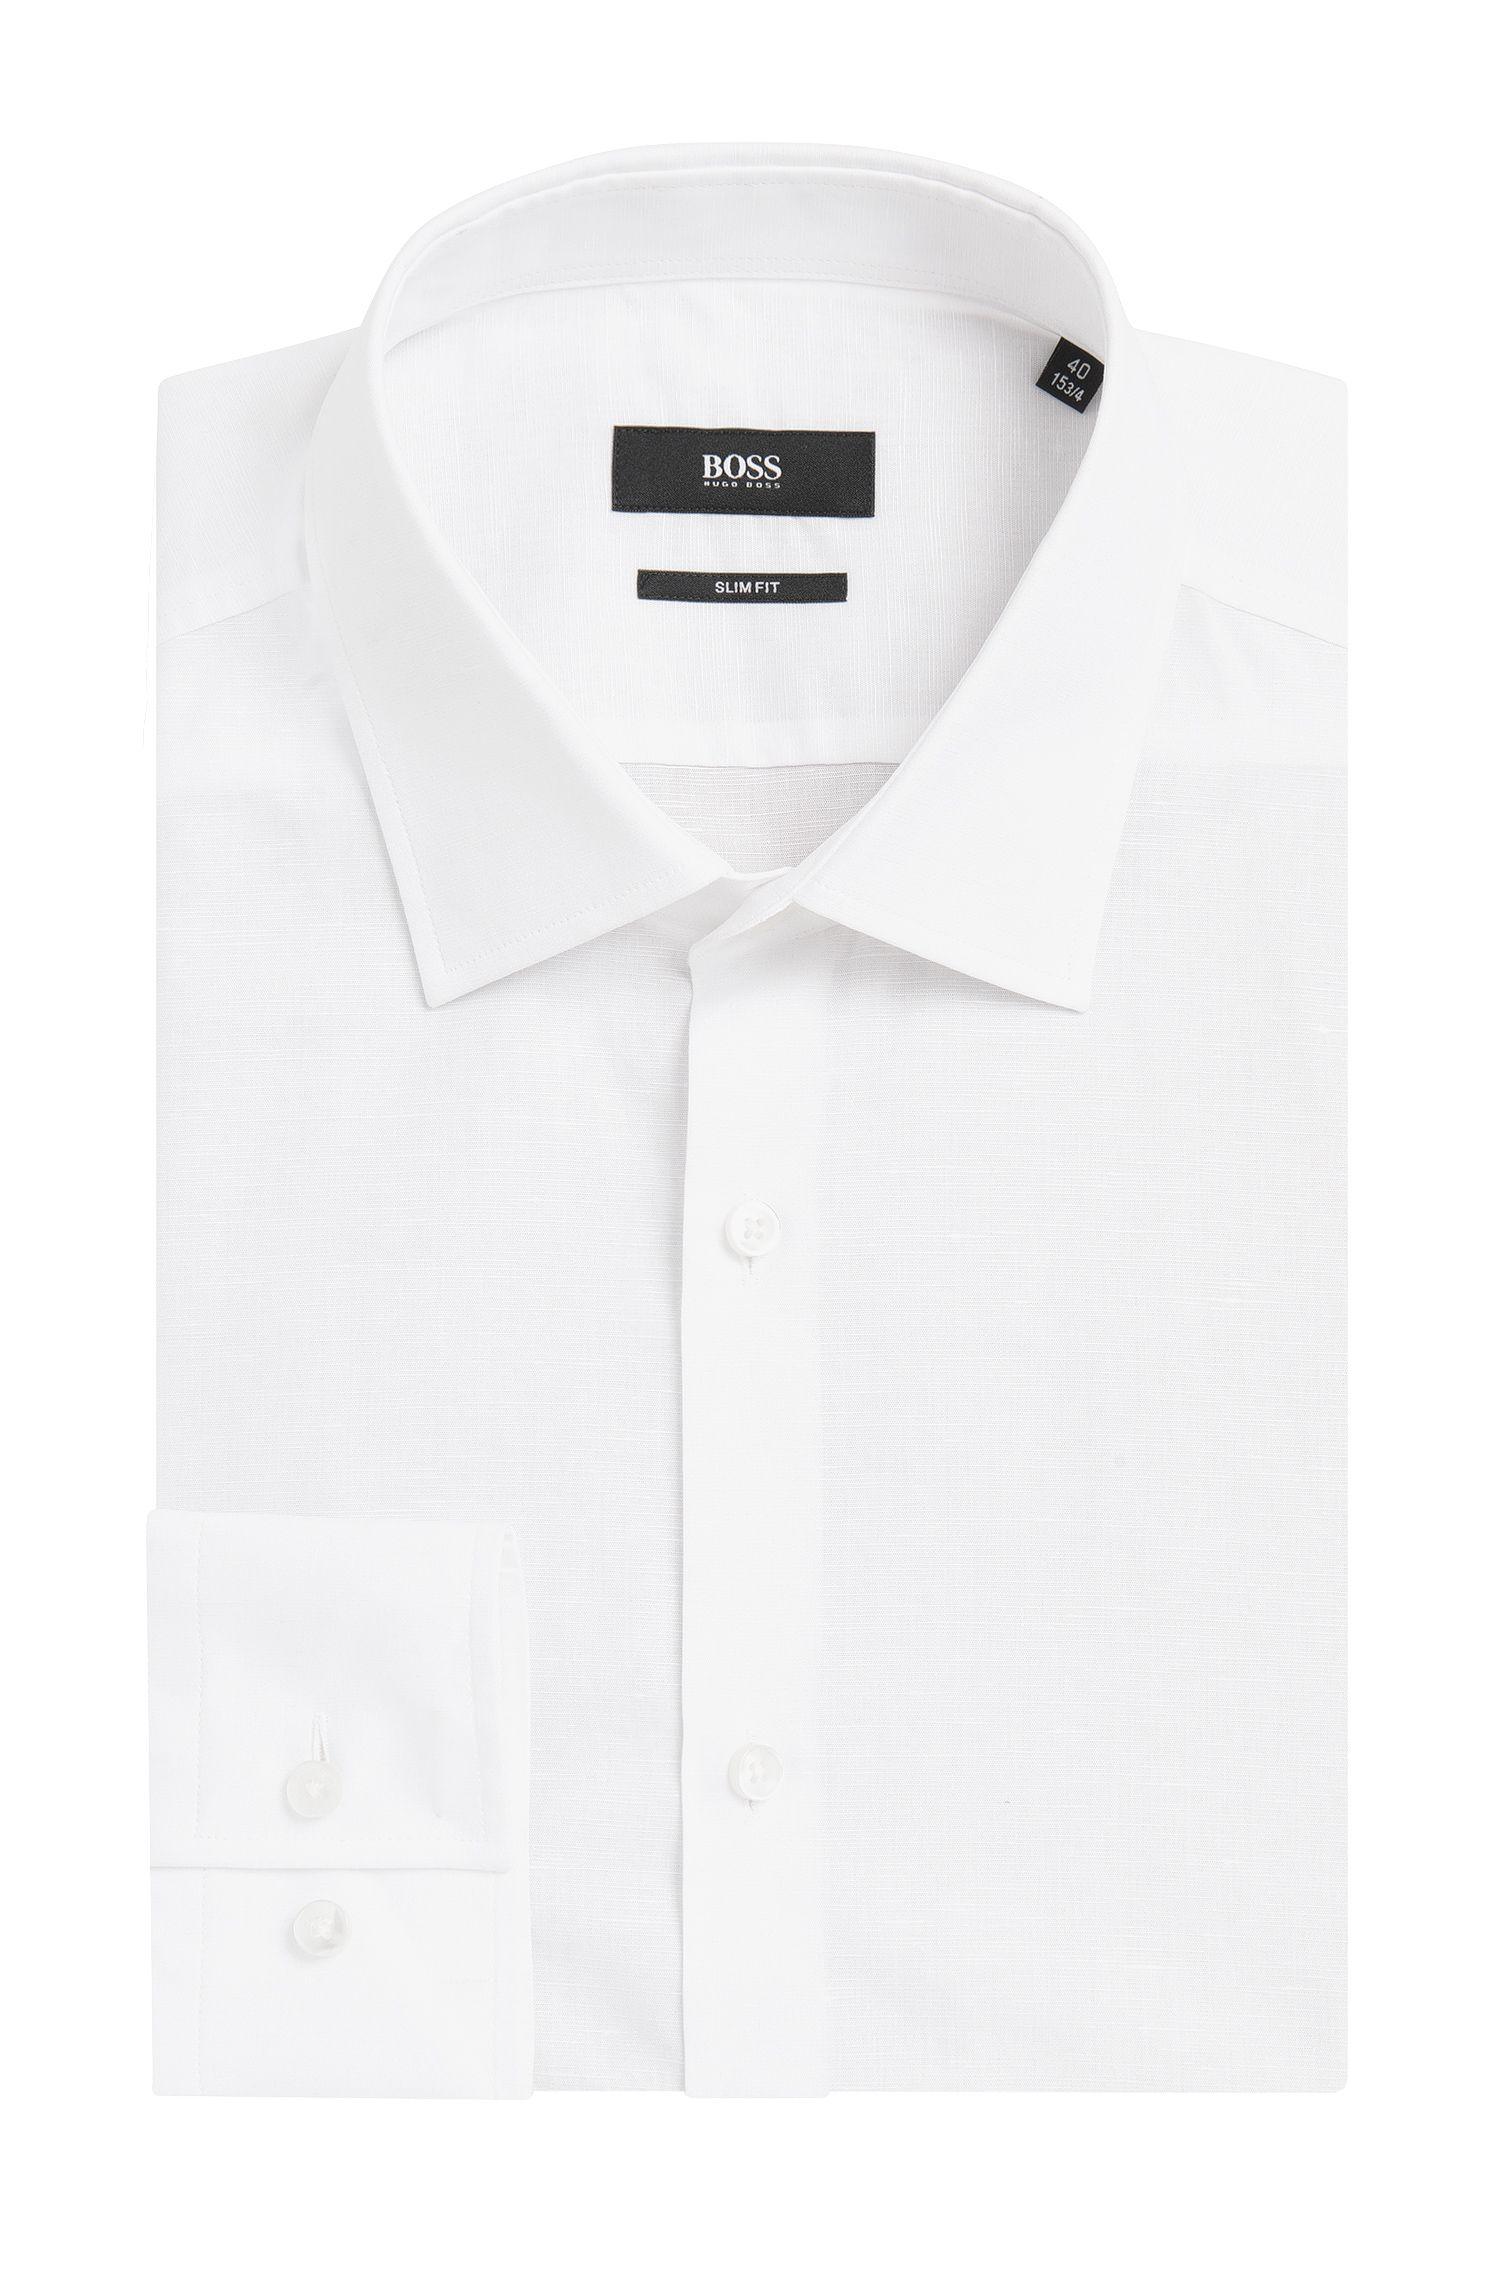 Italian Cotton-Linen Dress Shirt, Slim Fit | Jenno